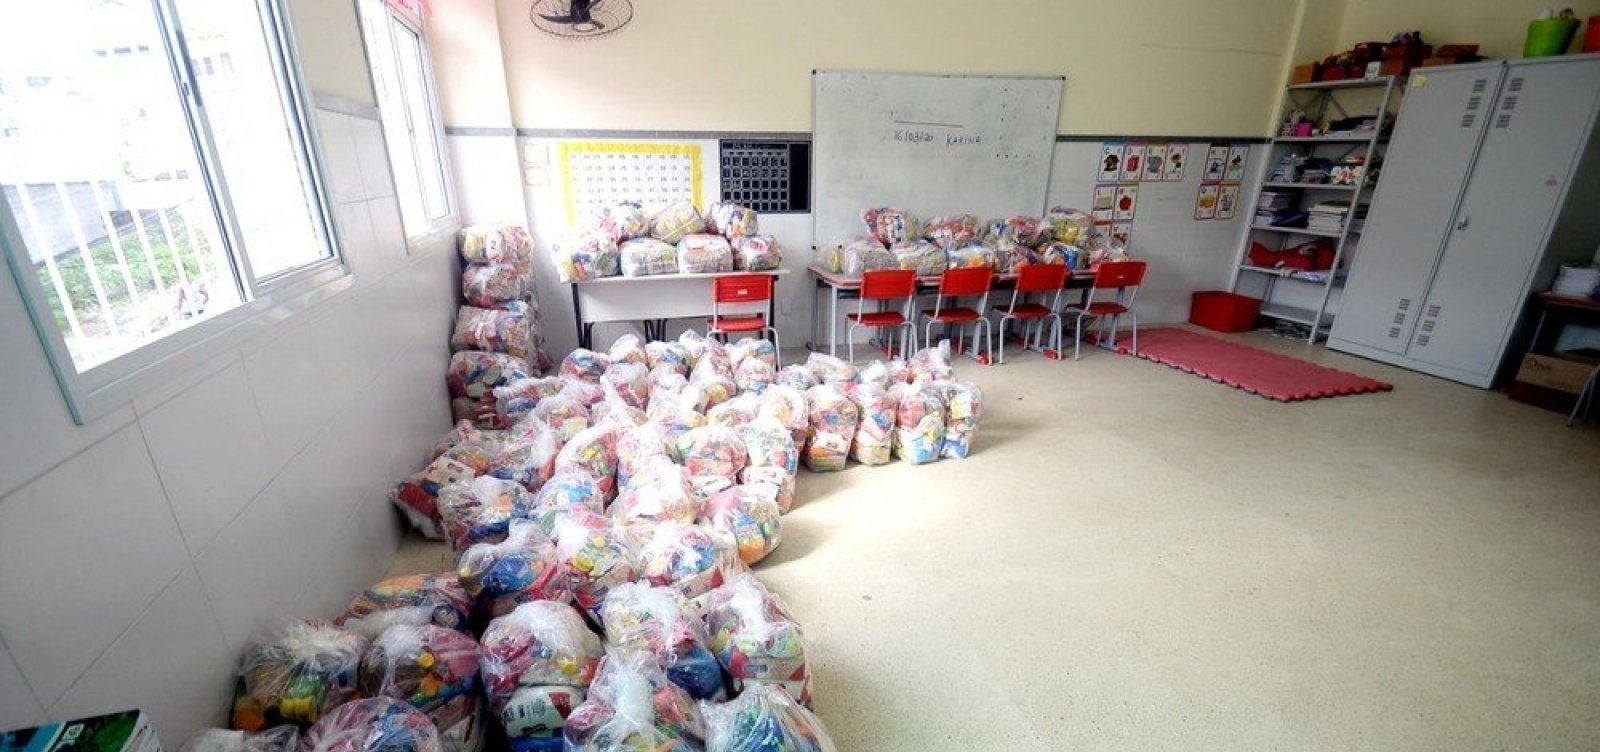 Prefeitura de Salvador inicia nova etapa de entrega de cestas básicas para alunos nesta segunda